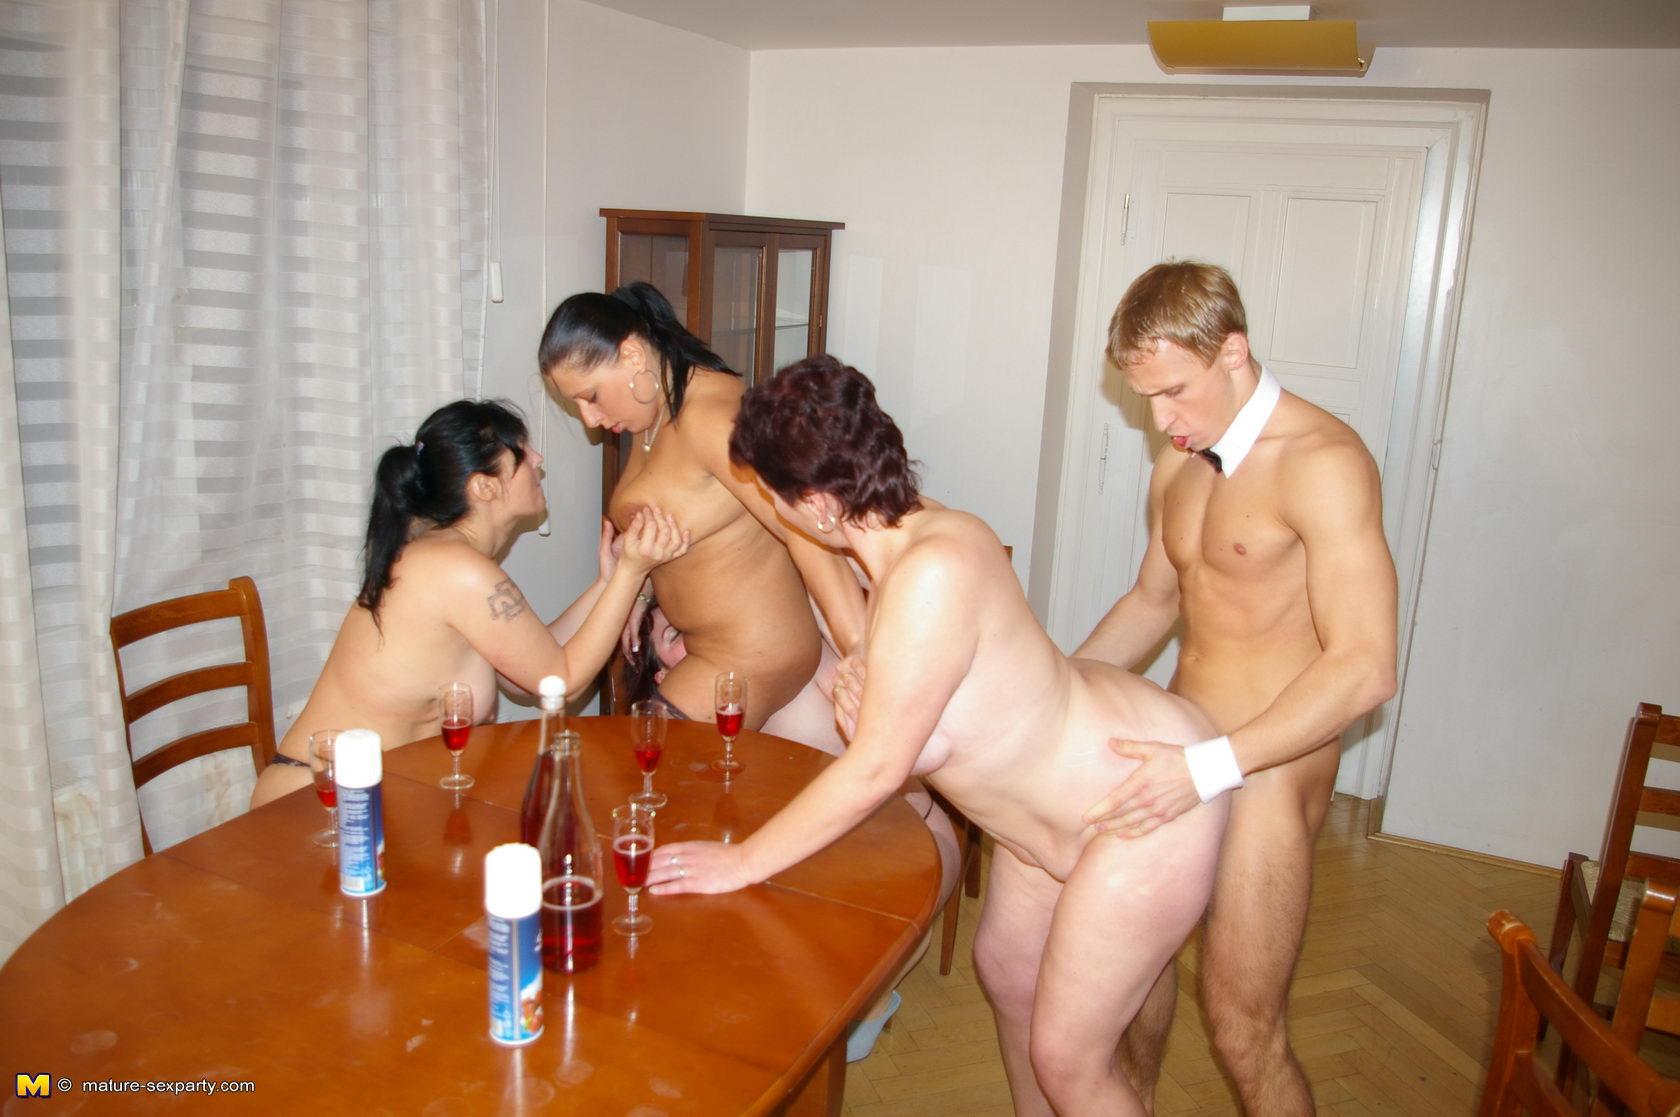 Секс тетки и племянника в бане 21 фотография